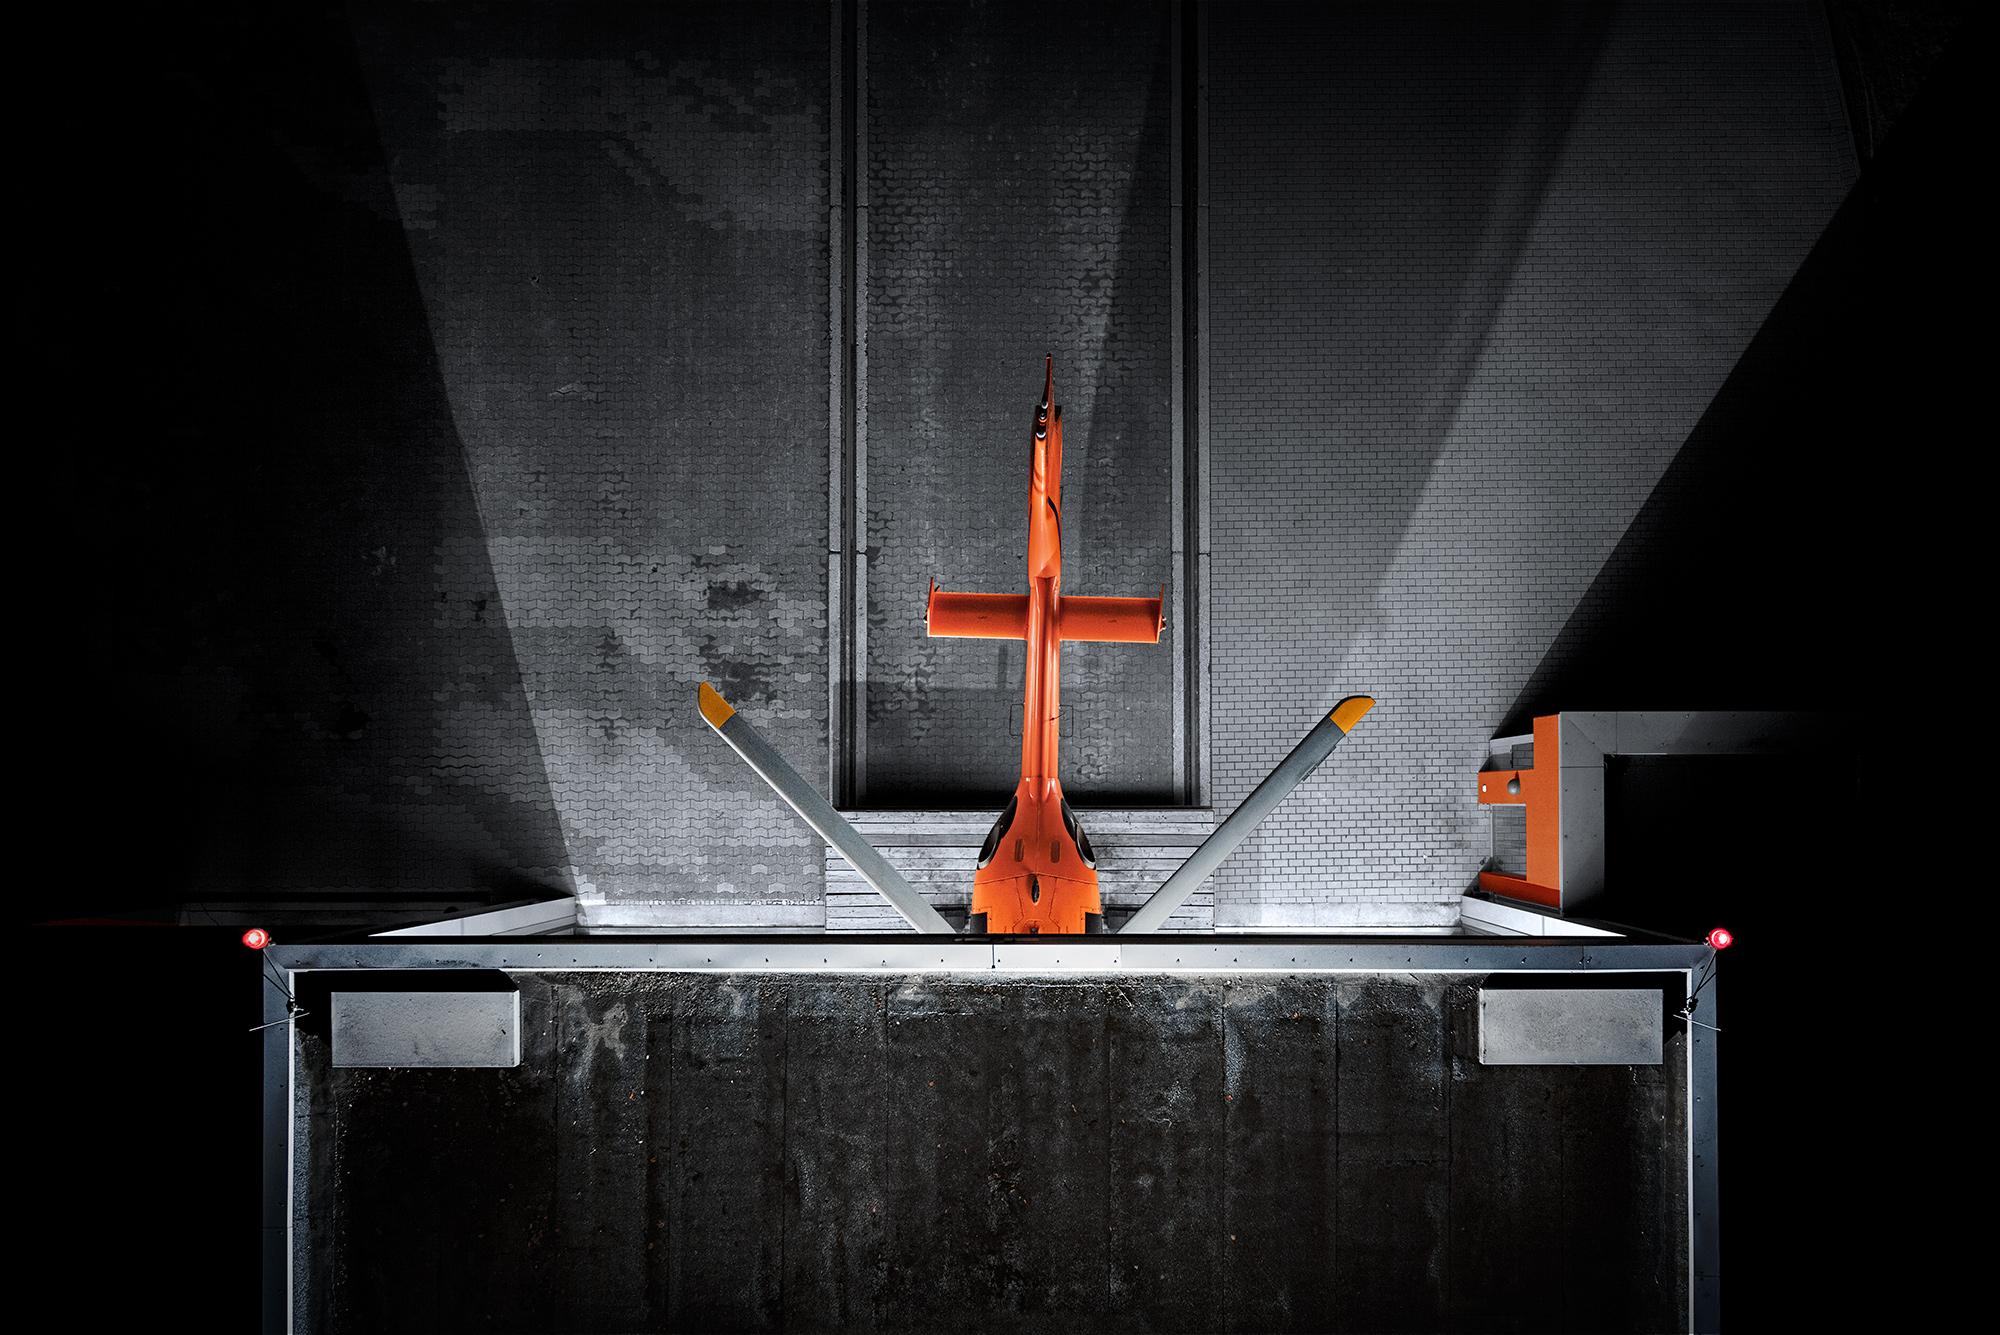 kopterwork christoph 13 Rettungshubschrauber Moritz Götte Fotografie & Simon Eymann Mehrfachbelichtung